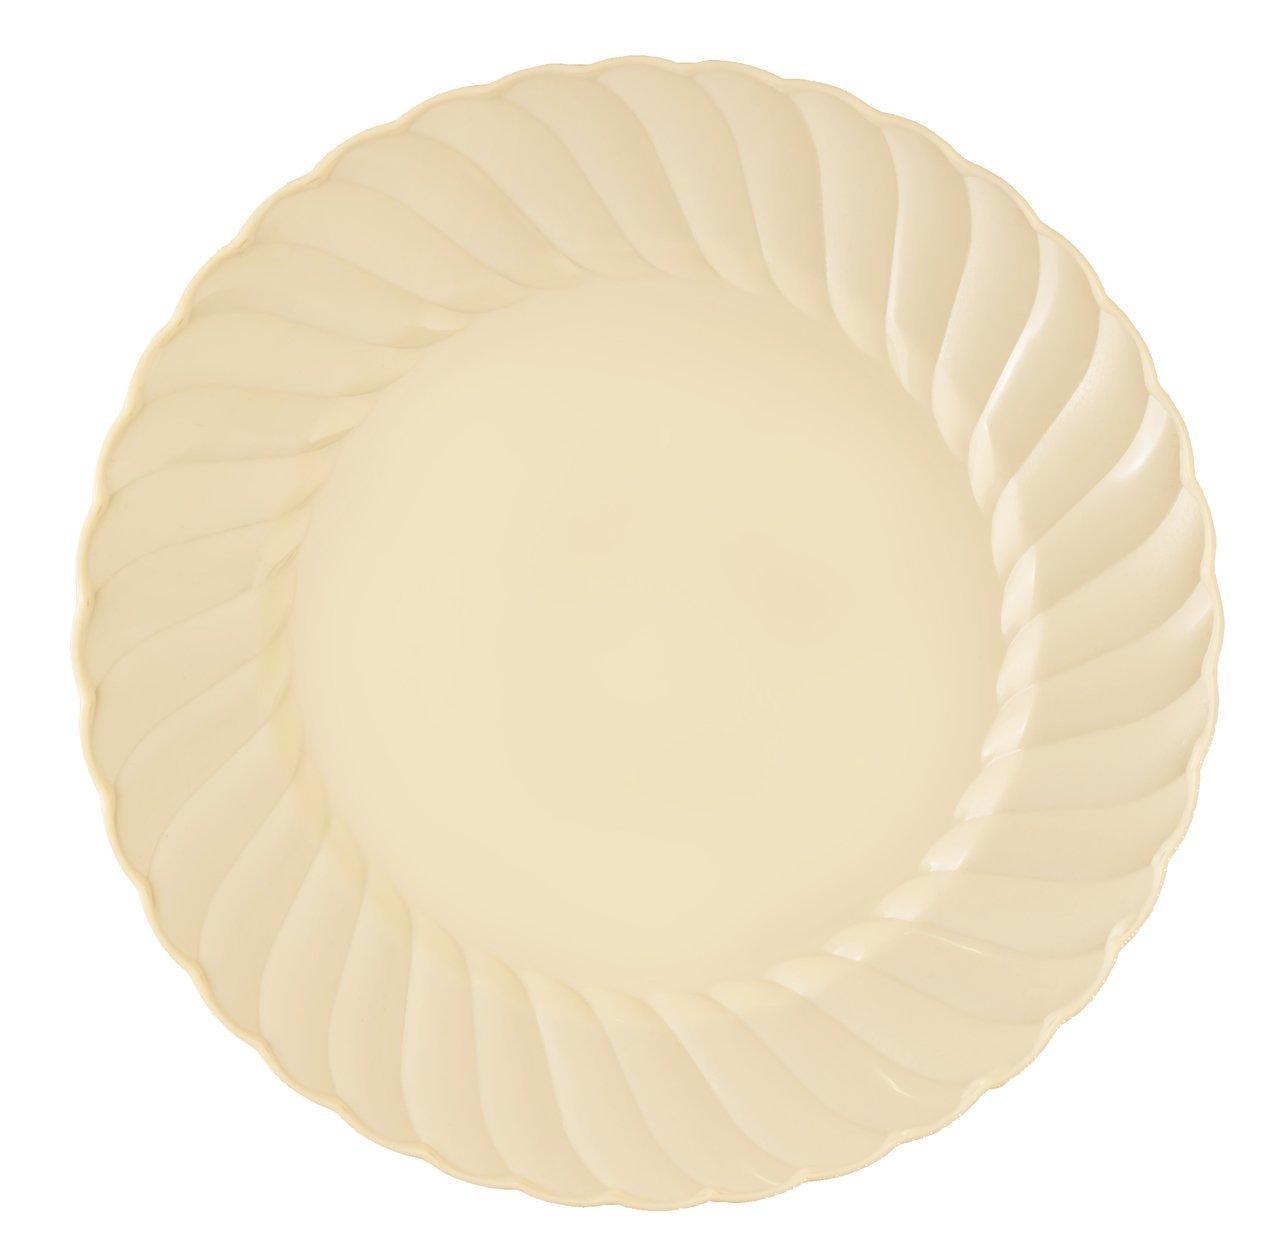 Kaya Collection - Disposable Bone Plastic Round 9